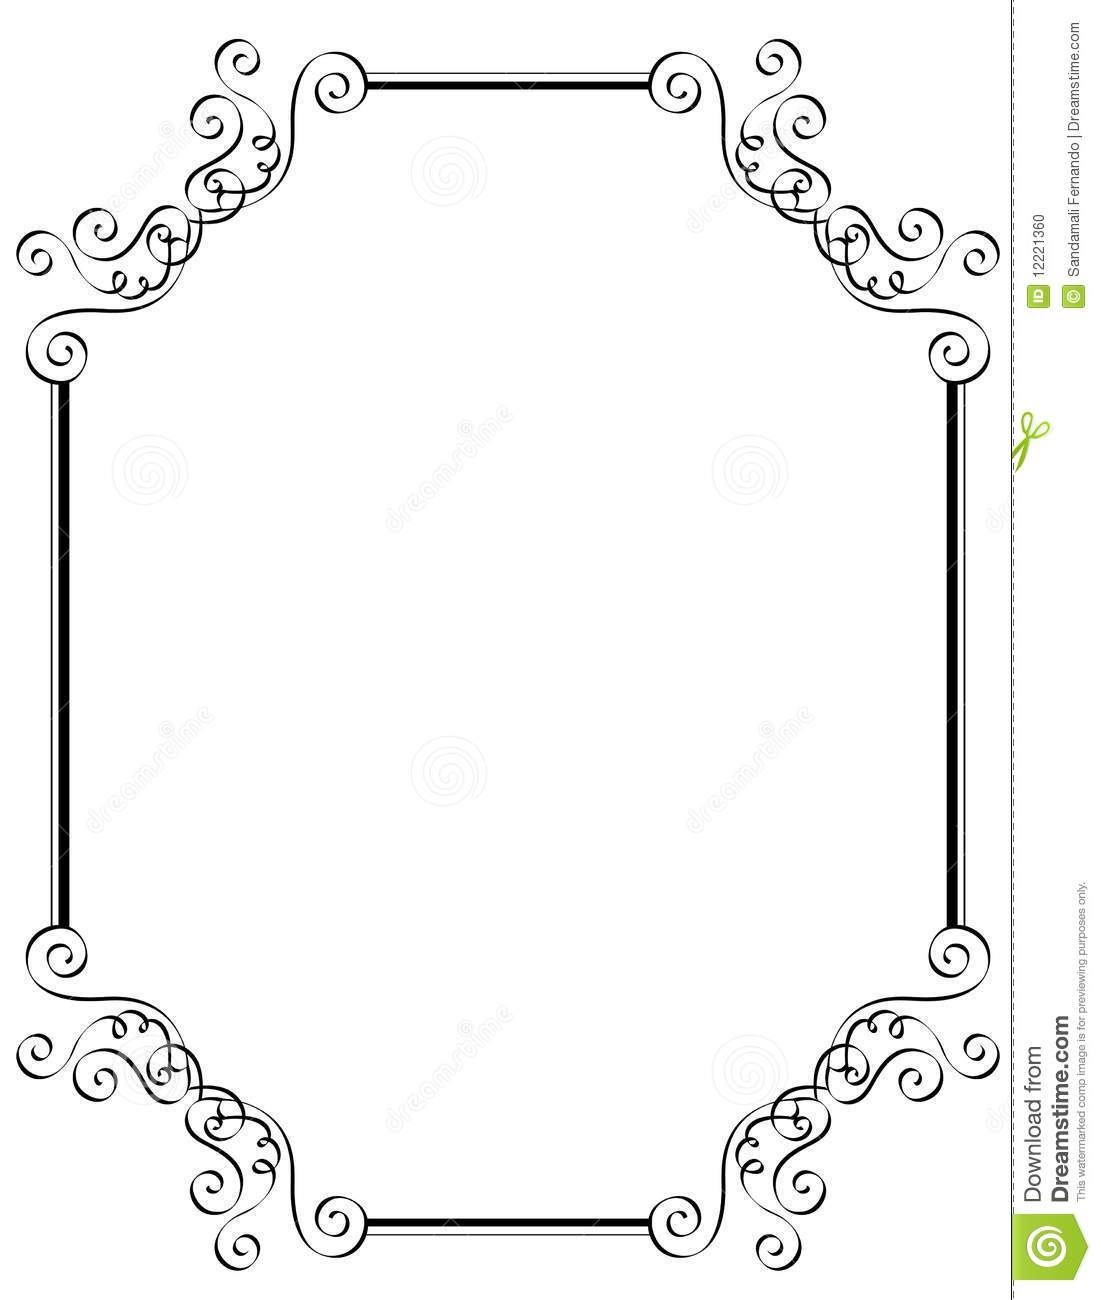 Free Printable Wedding Clipart Borders 2 » Clipart Portal - Free Printable Wedding Clipart Borders